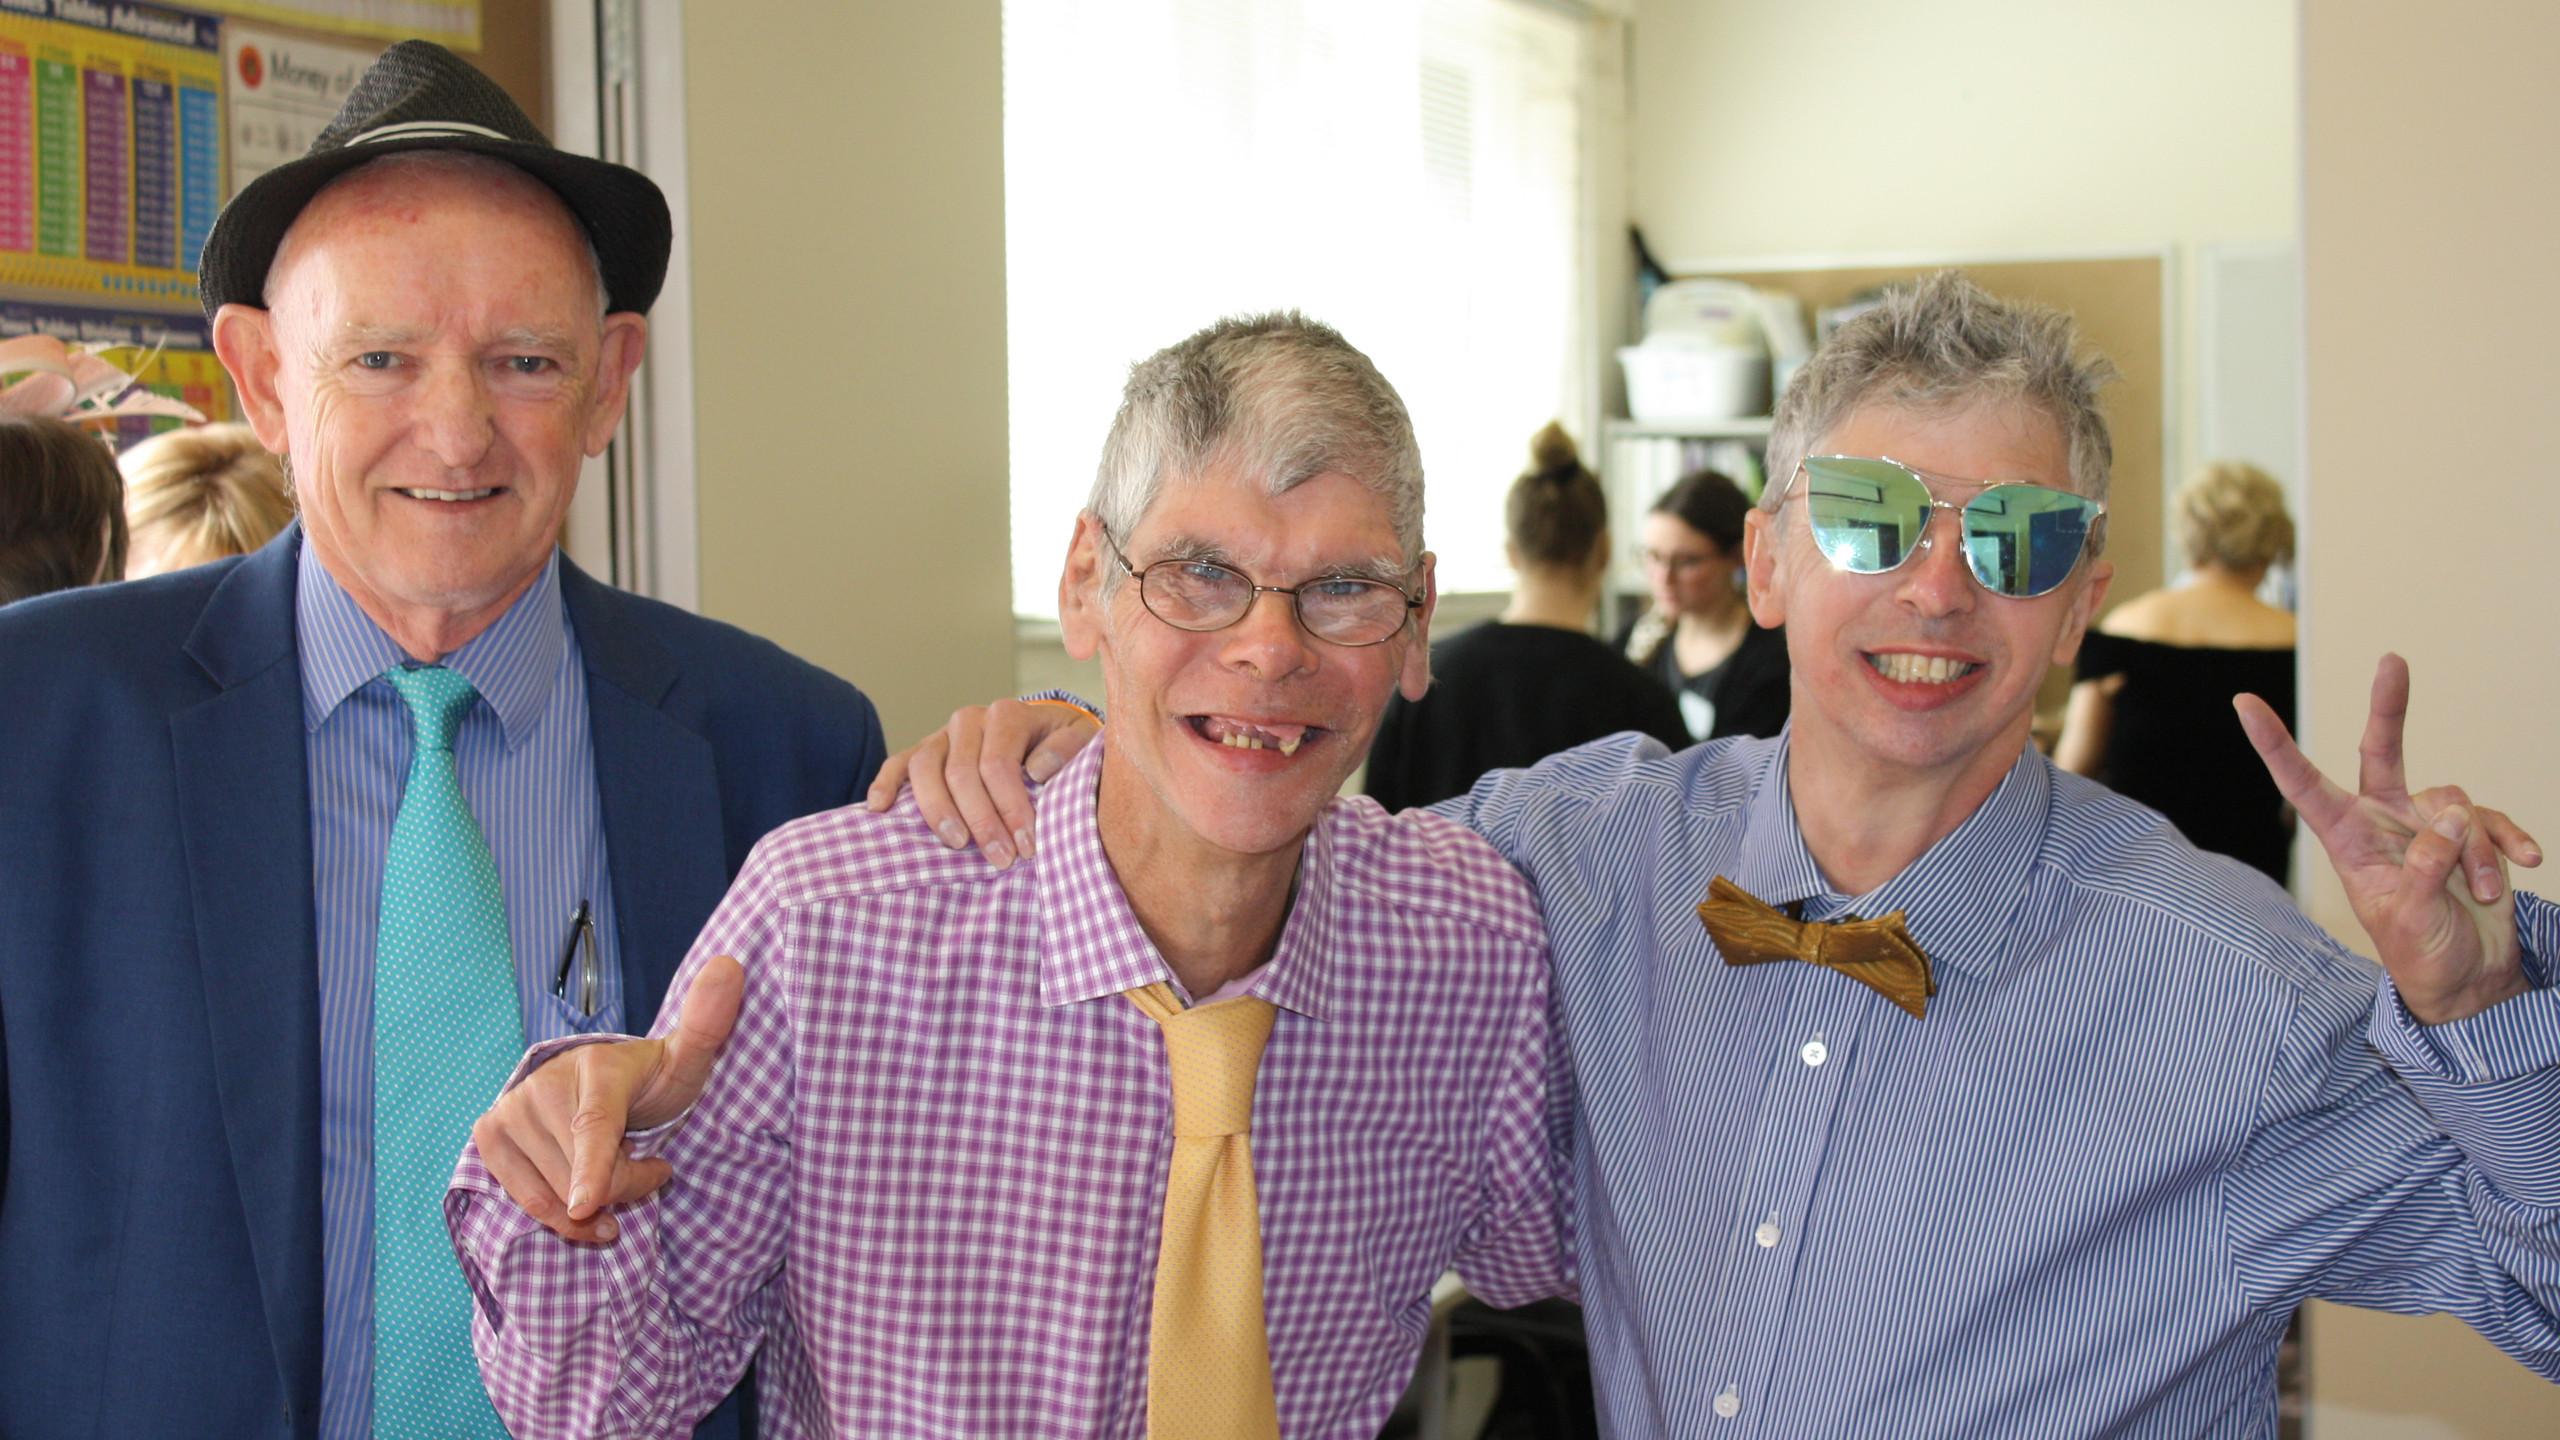 Alan, Trevor & Daniel